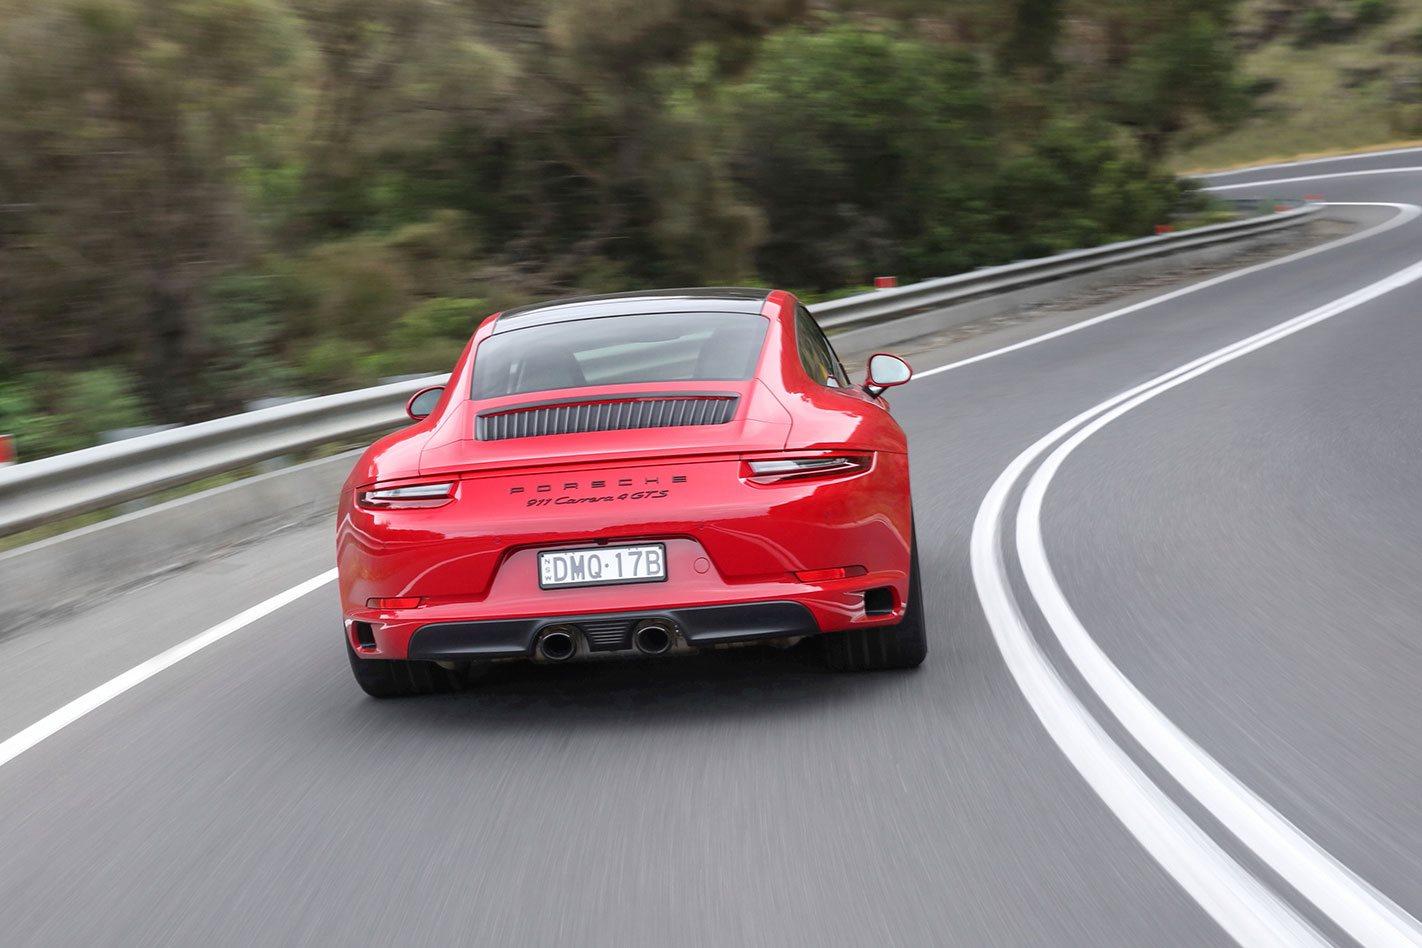 2018 Porsche 991.2 911 GTS rear drive